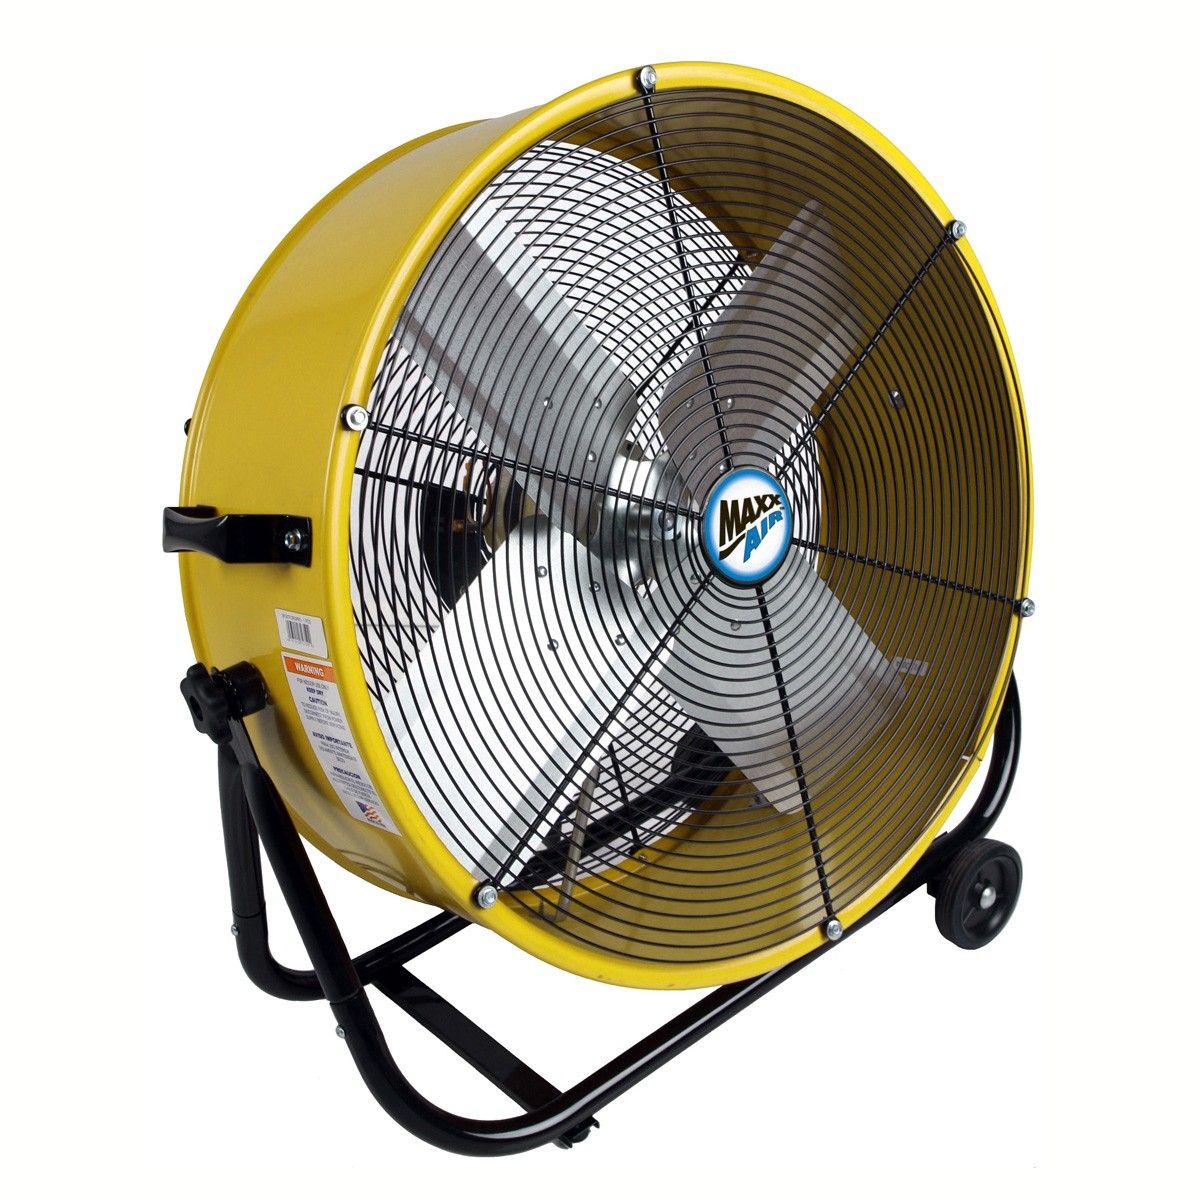 24 Inch Direct Drive Tilt Fan (With images) Floor fan